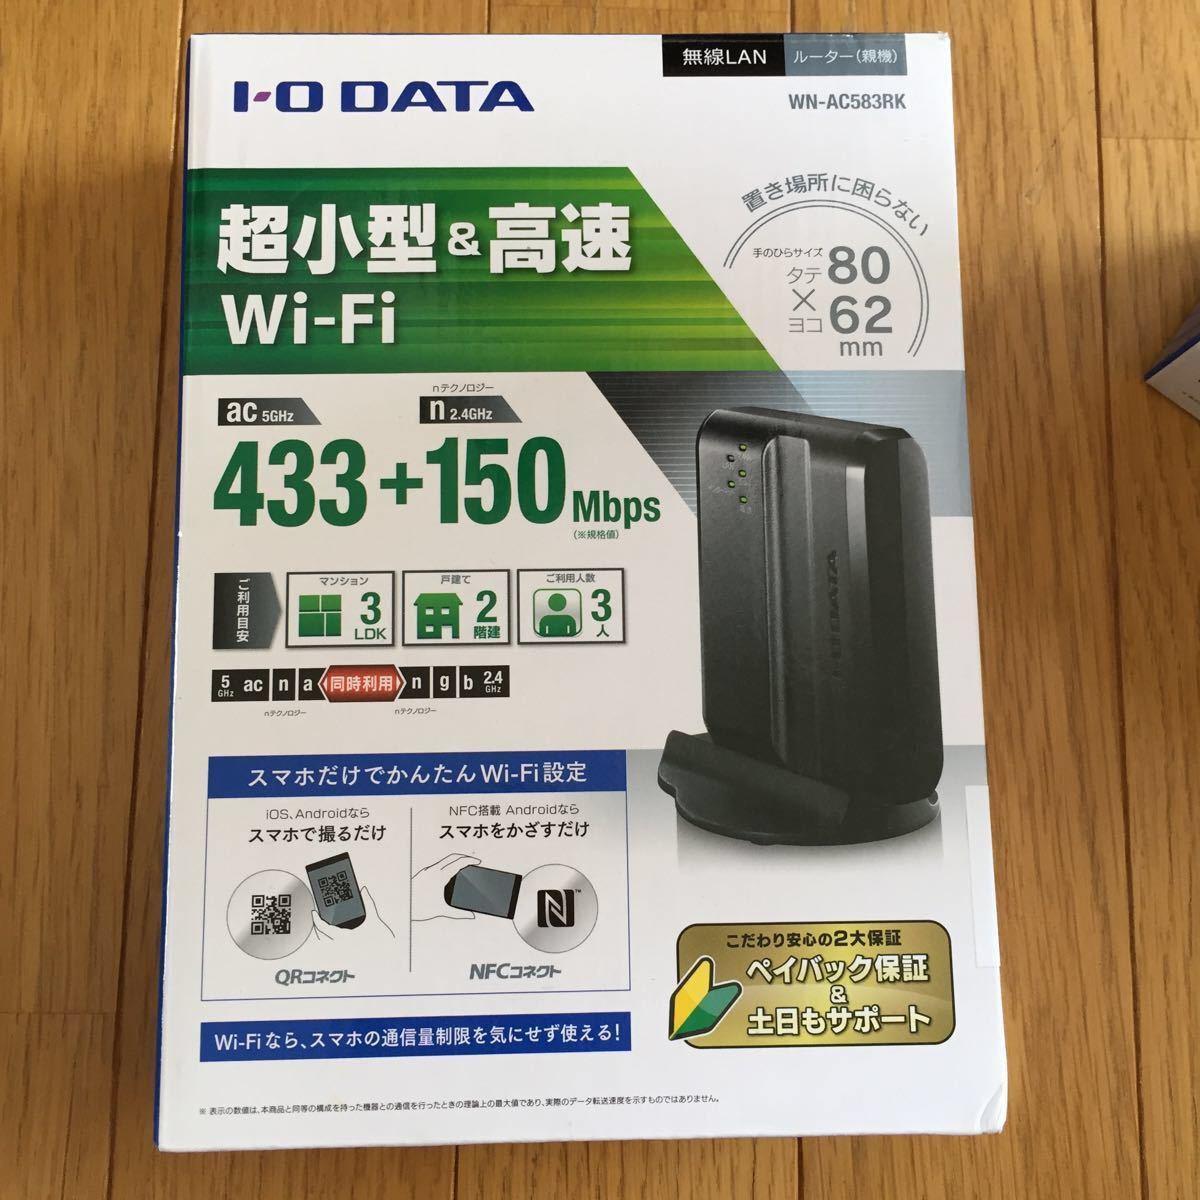 I-O DATA 11ac/n/a/g/b 対応 無線LAN親機(Wi-Fiルーター) 433Mbps WN-AC583RK2 1